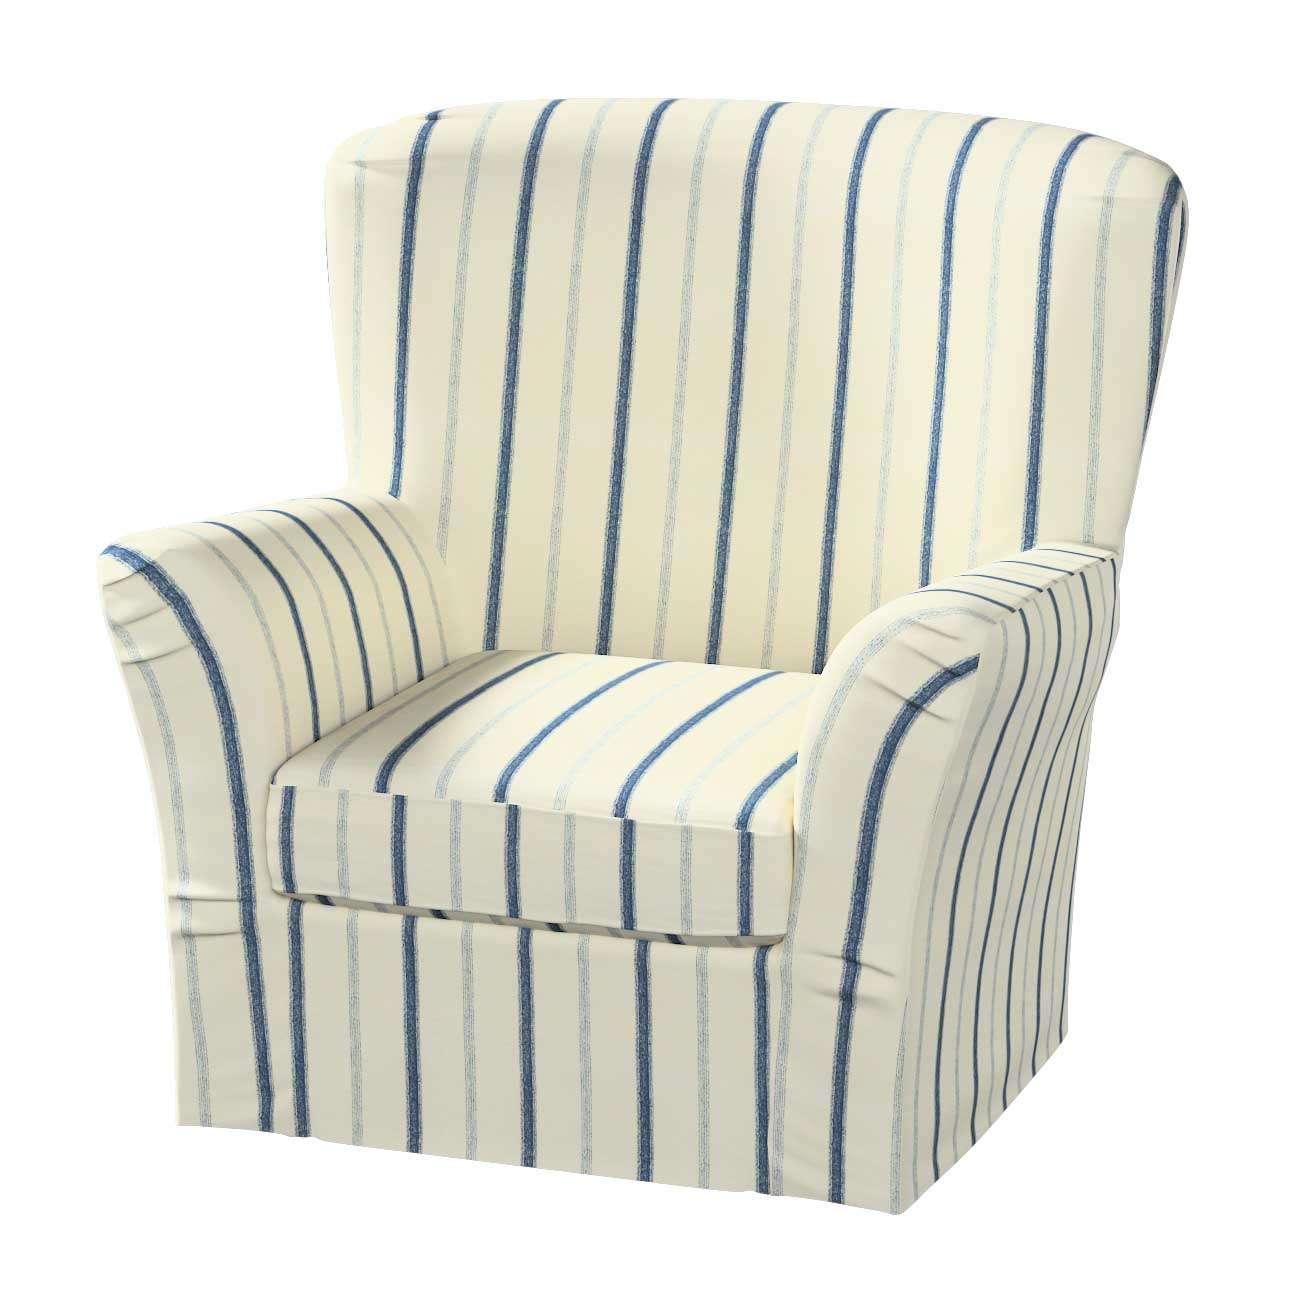 Tomelilla armchair  in collection Avinon, fabric: 129-66